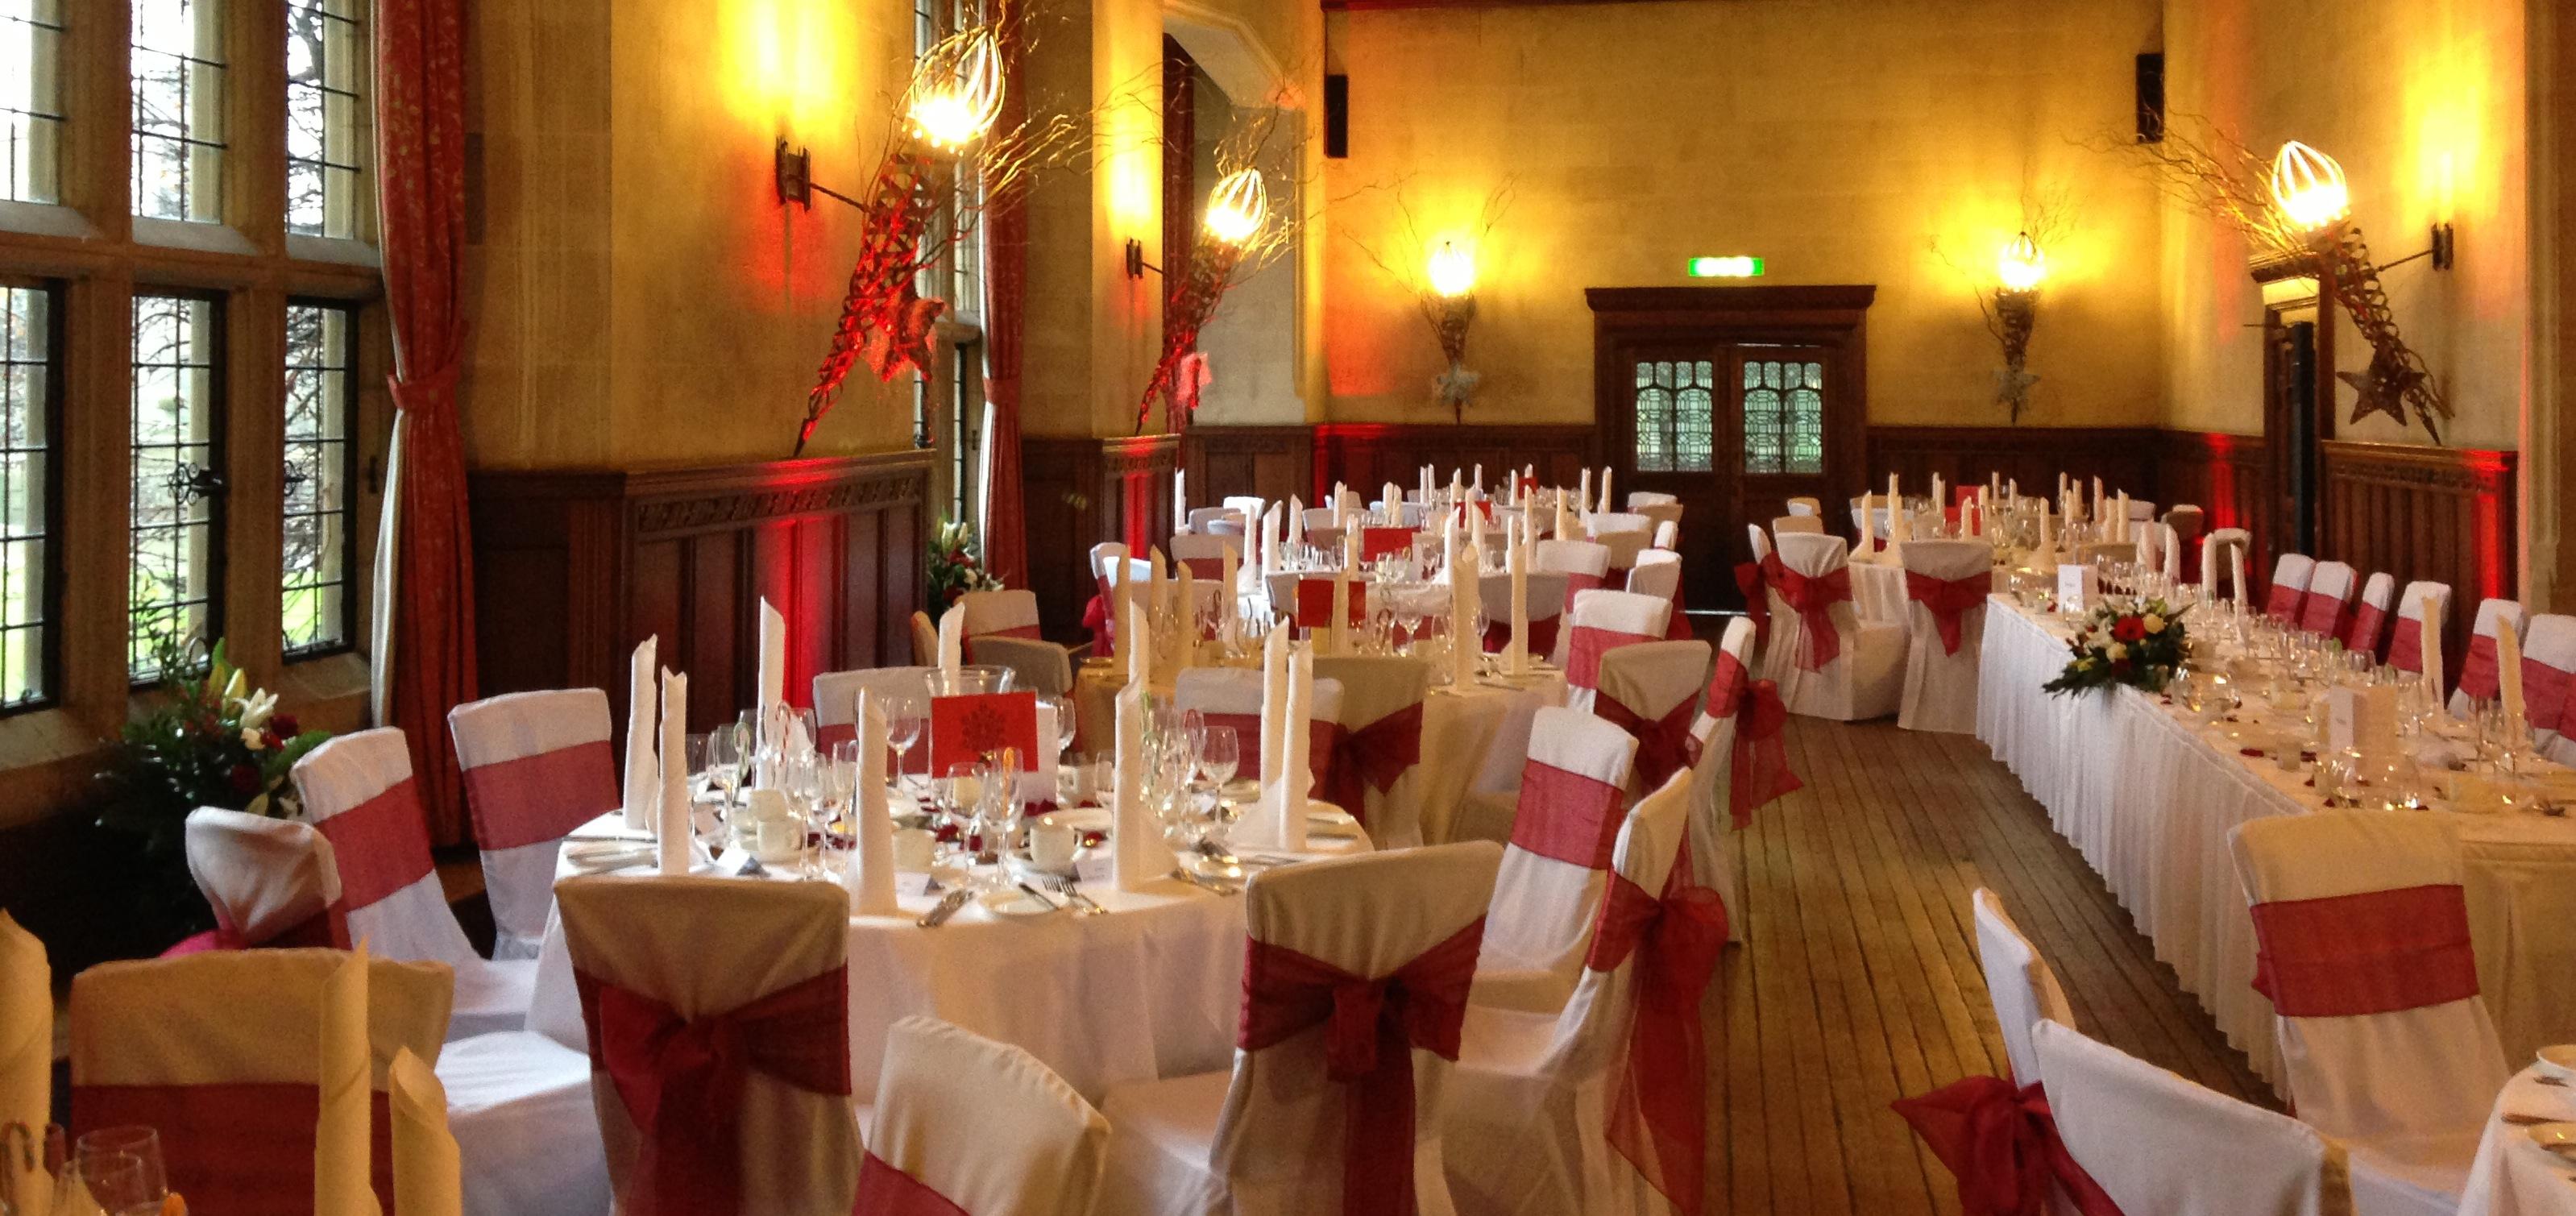 Kings Lynn Town Hall Wedding Fayre Tbrb Info